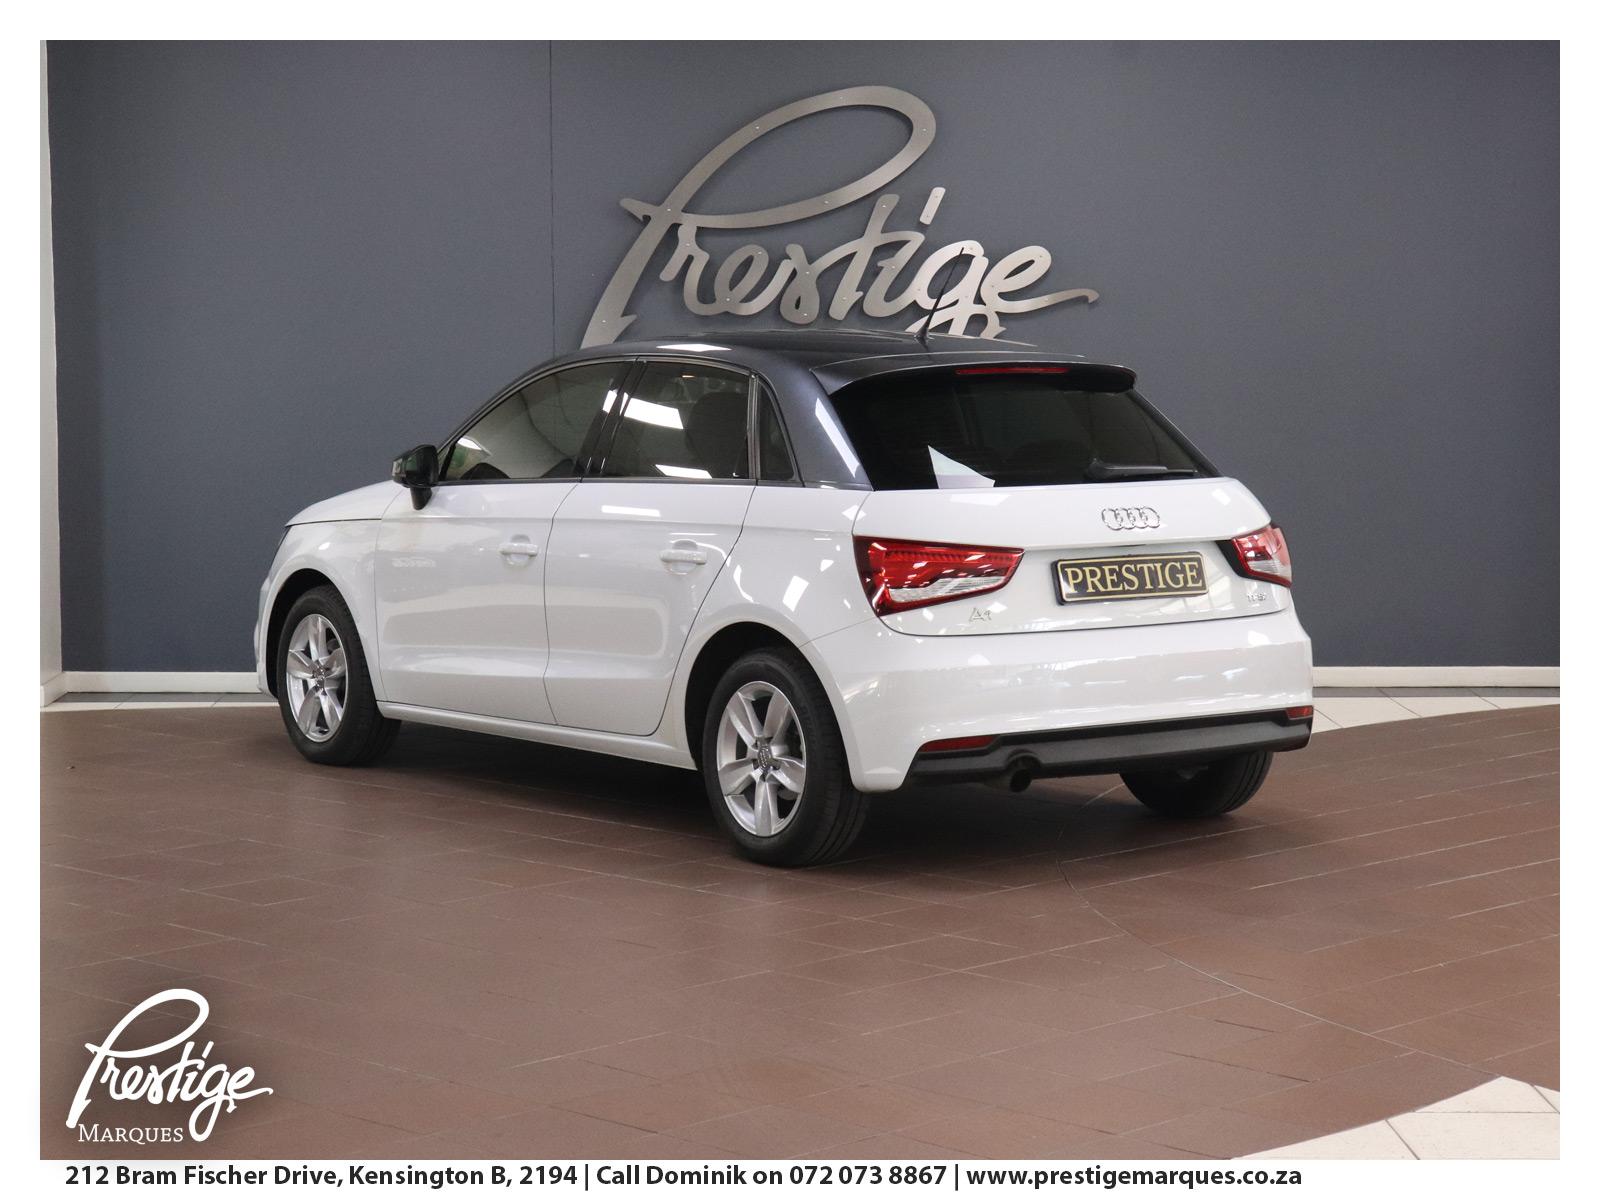 2015-Audi-A1-Prestige-Marques-Randburg-Sandton-4